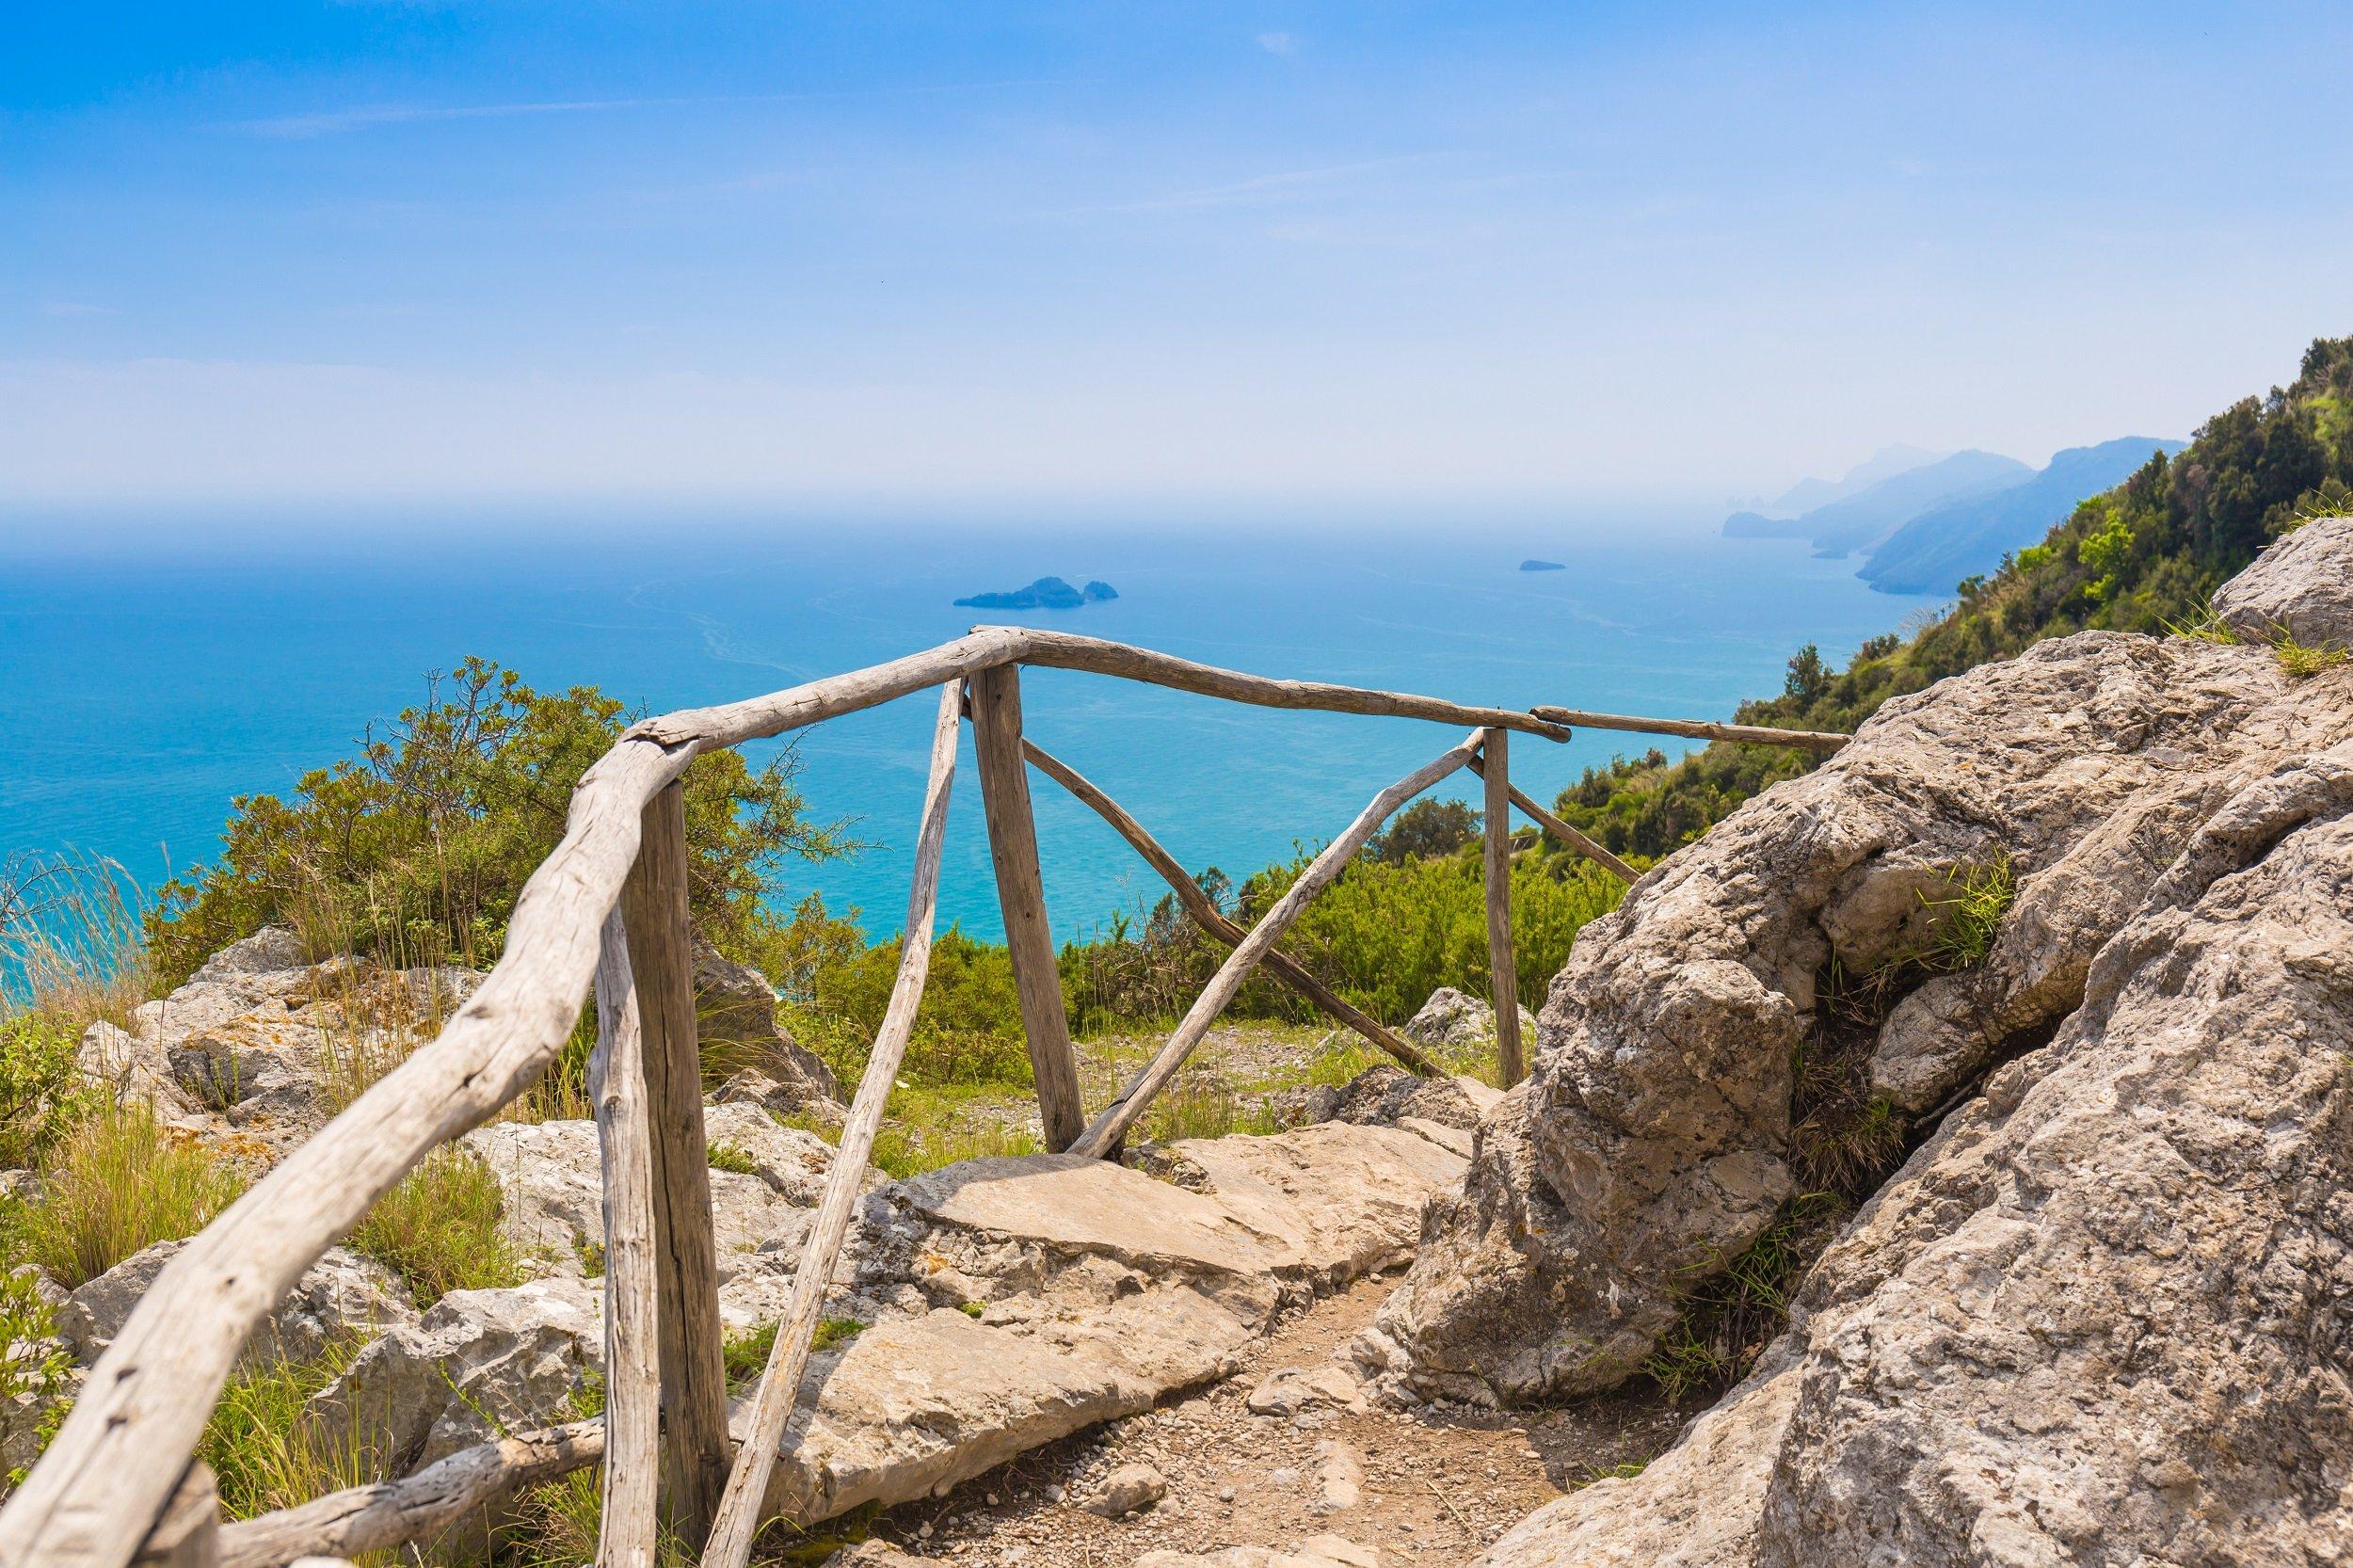 Path Of The Gods Amalfi Coast Hiking Tour From Sorrento_6